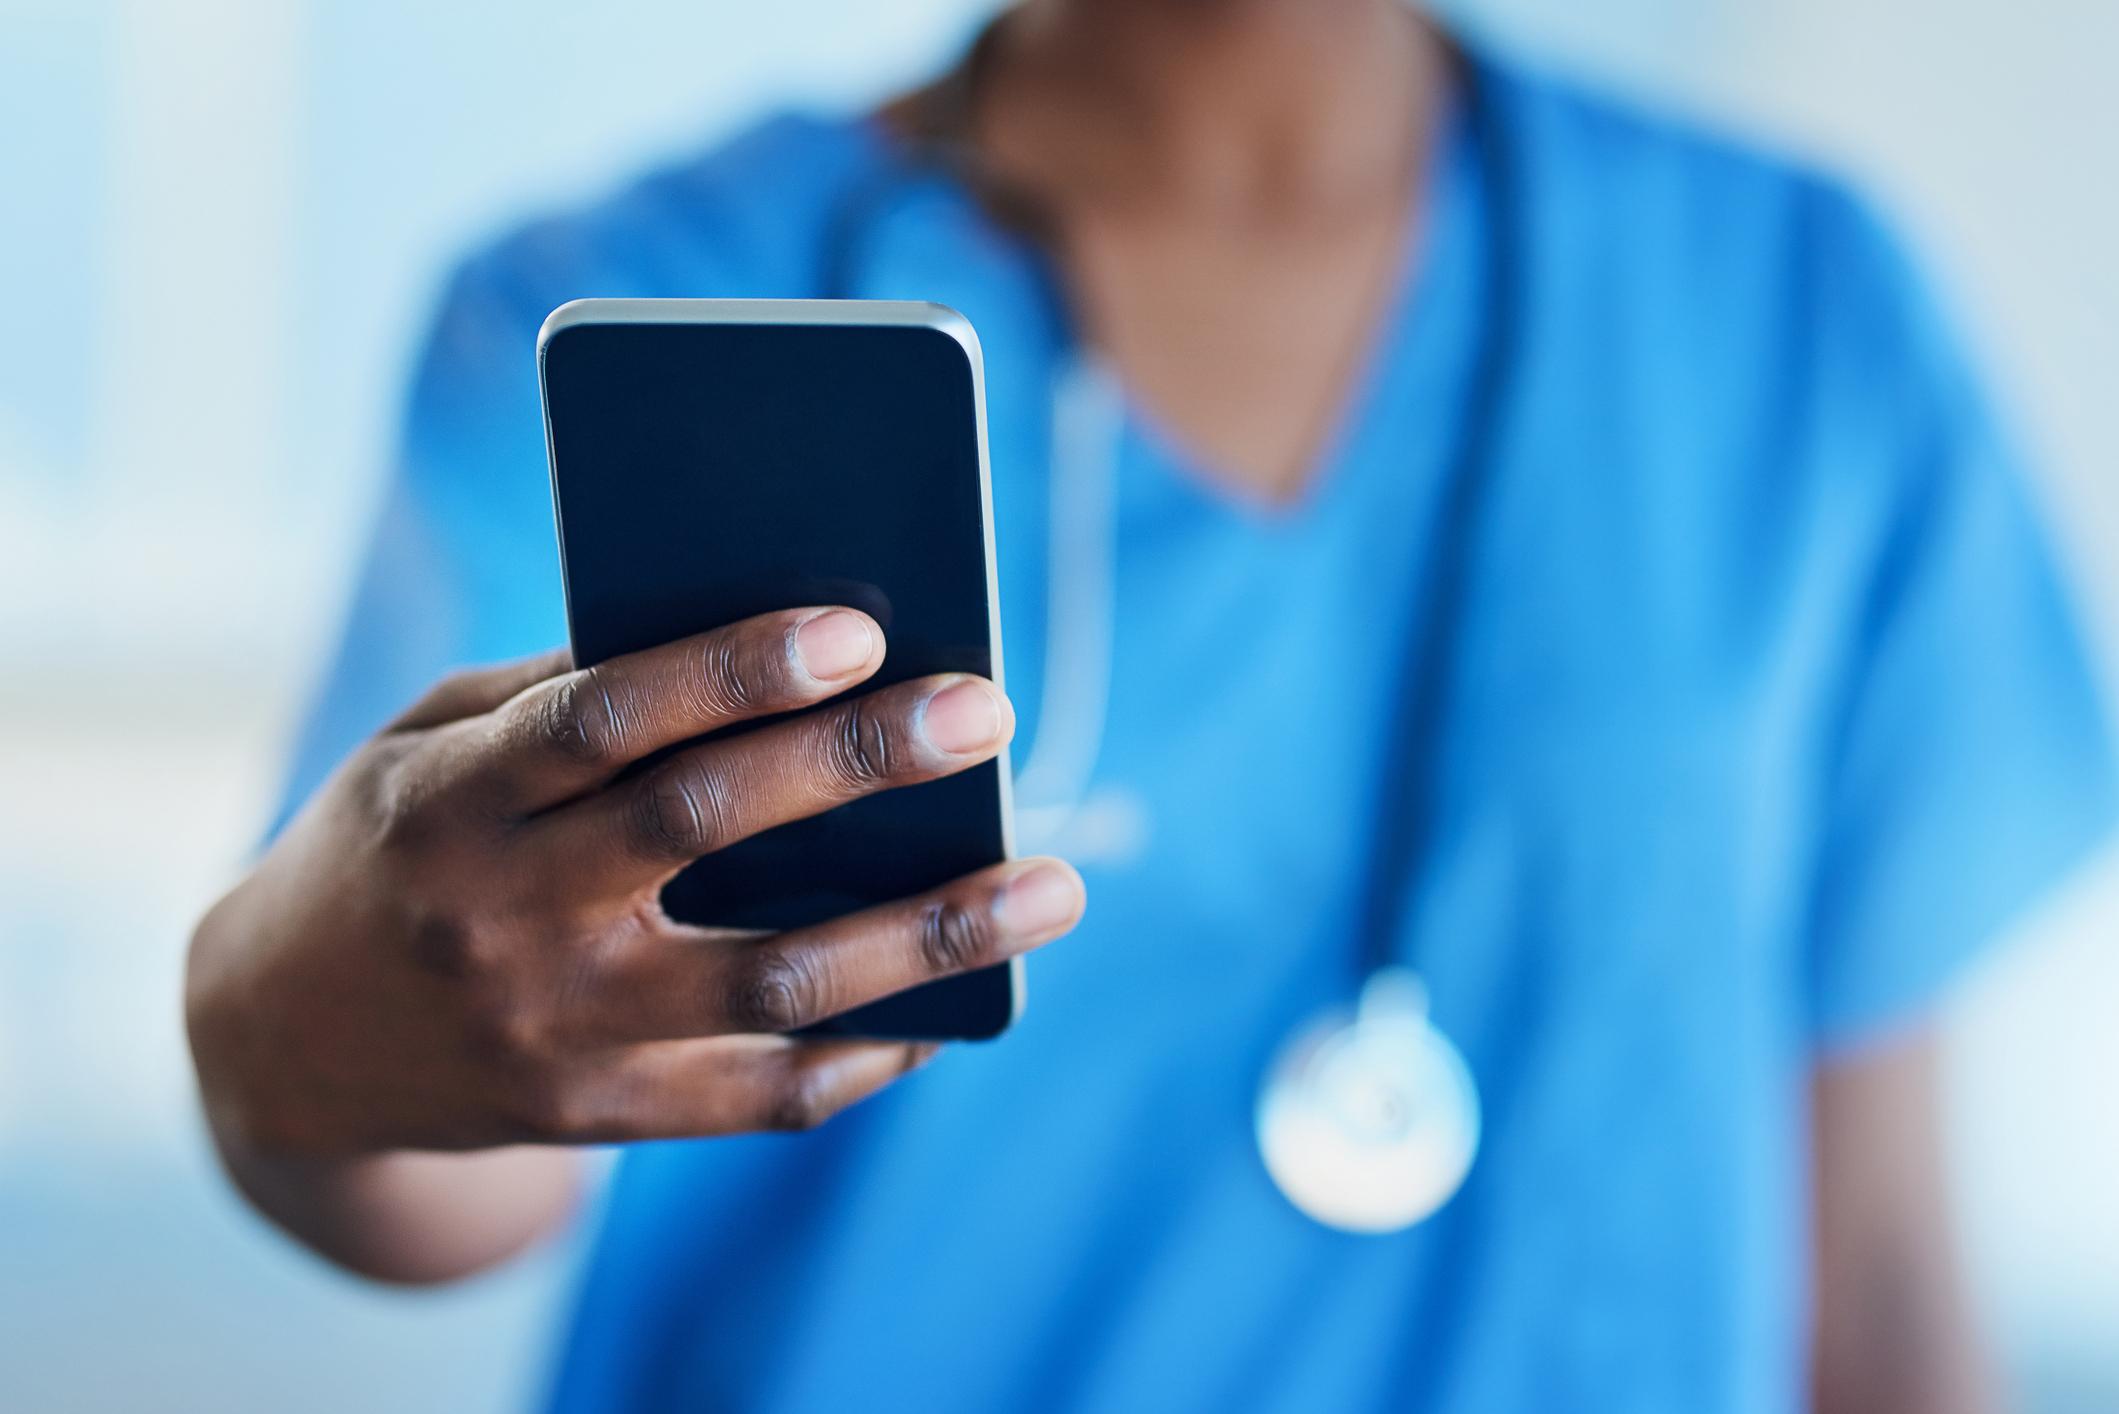 Closeup shot of an unrecognizable nurse using a cellphone in a hospital